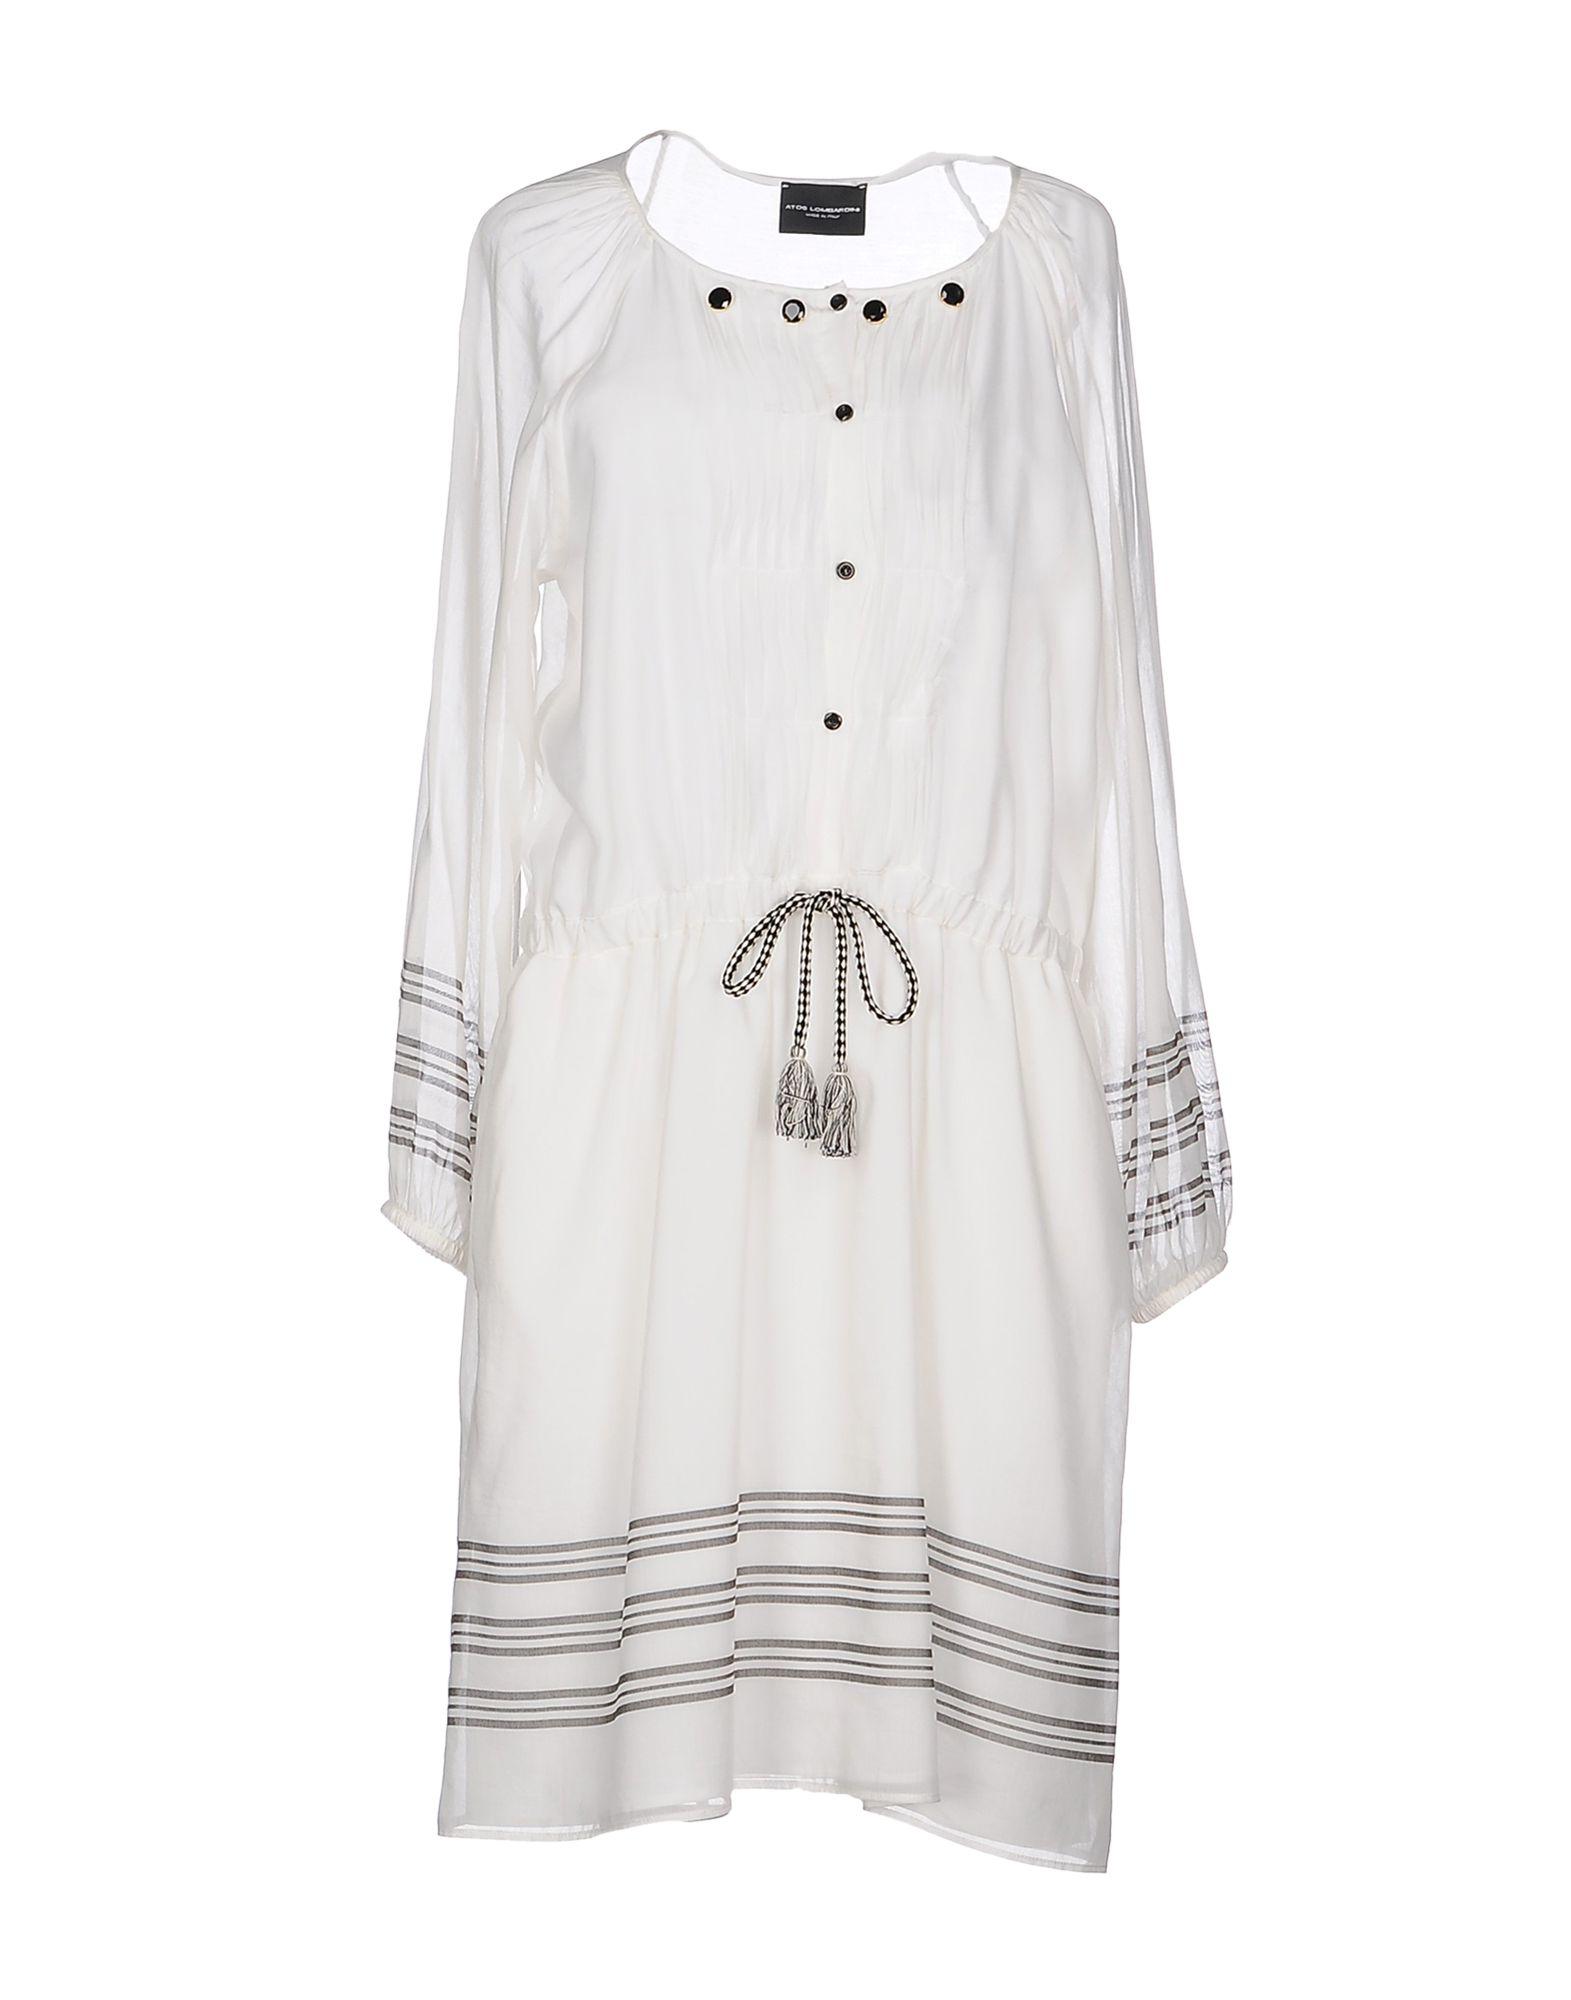 ATOS LOMBARDINI Damen Kurzes Kleid Farbe Weiß Größe 3